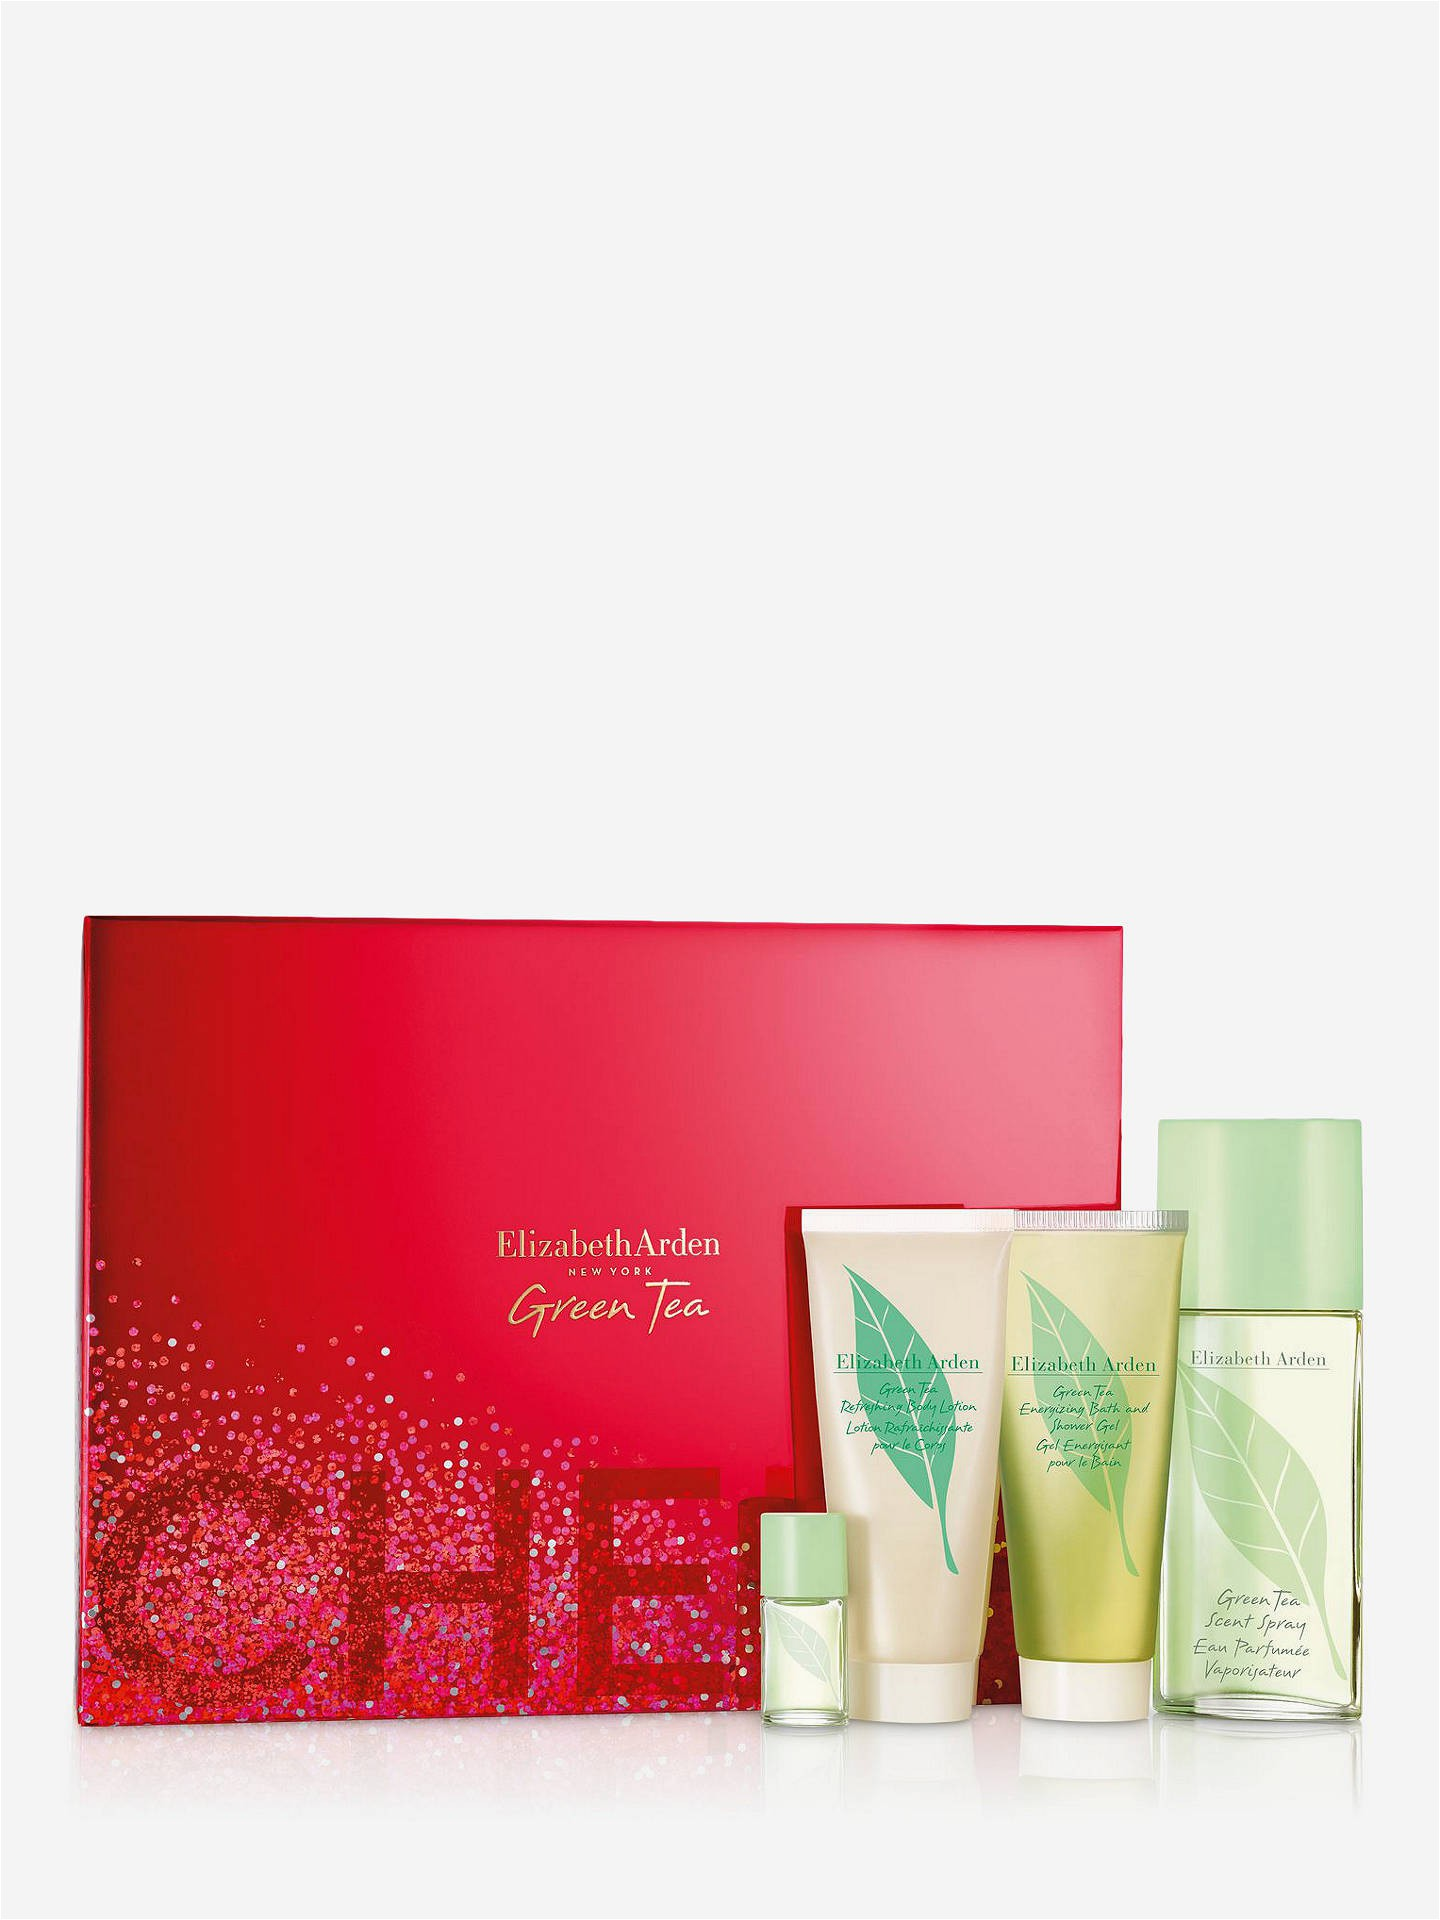 Elizabeth Arden Bath Rug Elizabeth Arden Green Tea Fragrance and Body Gift Set at